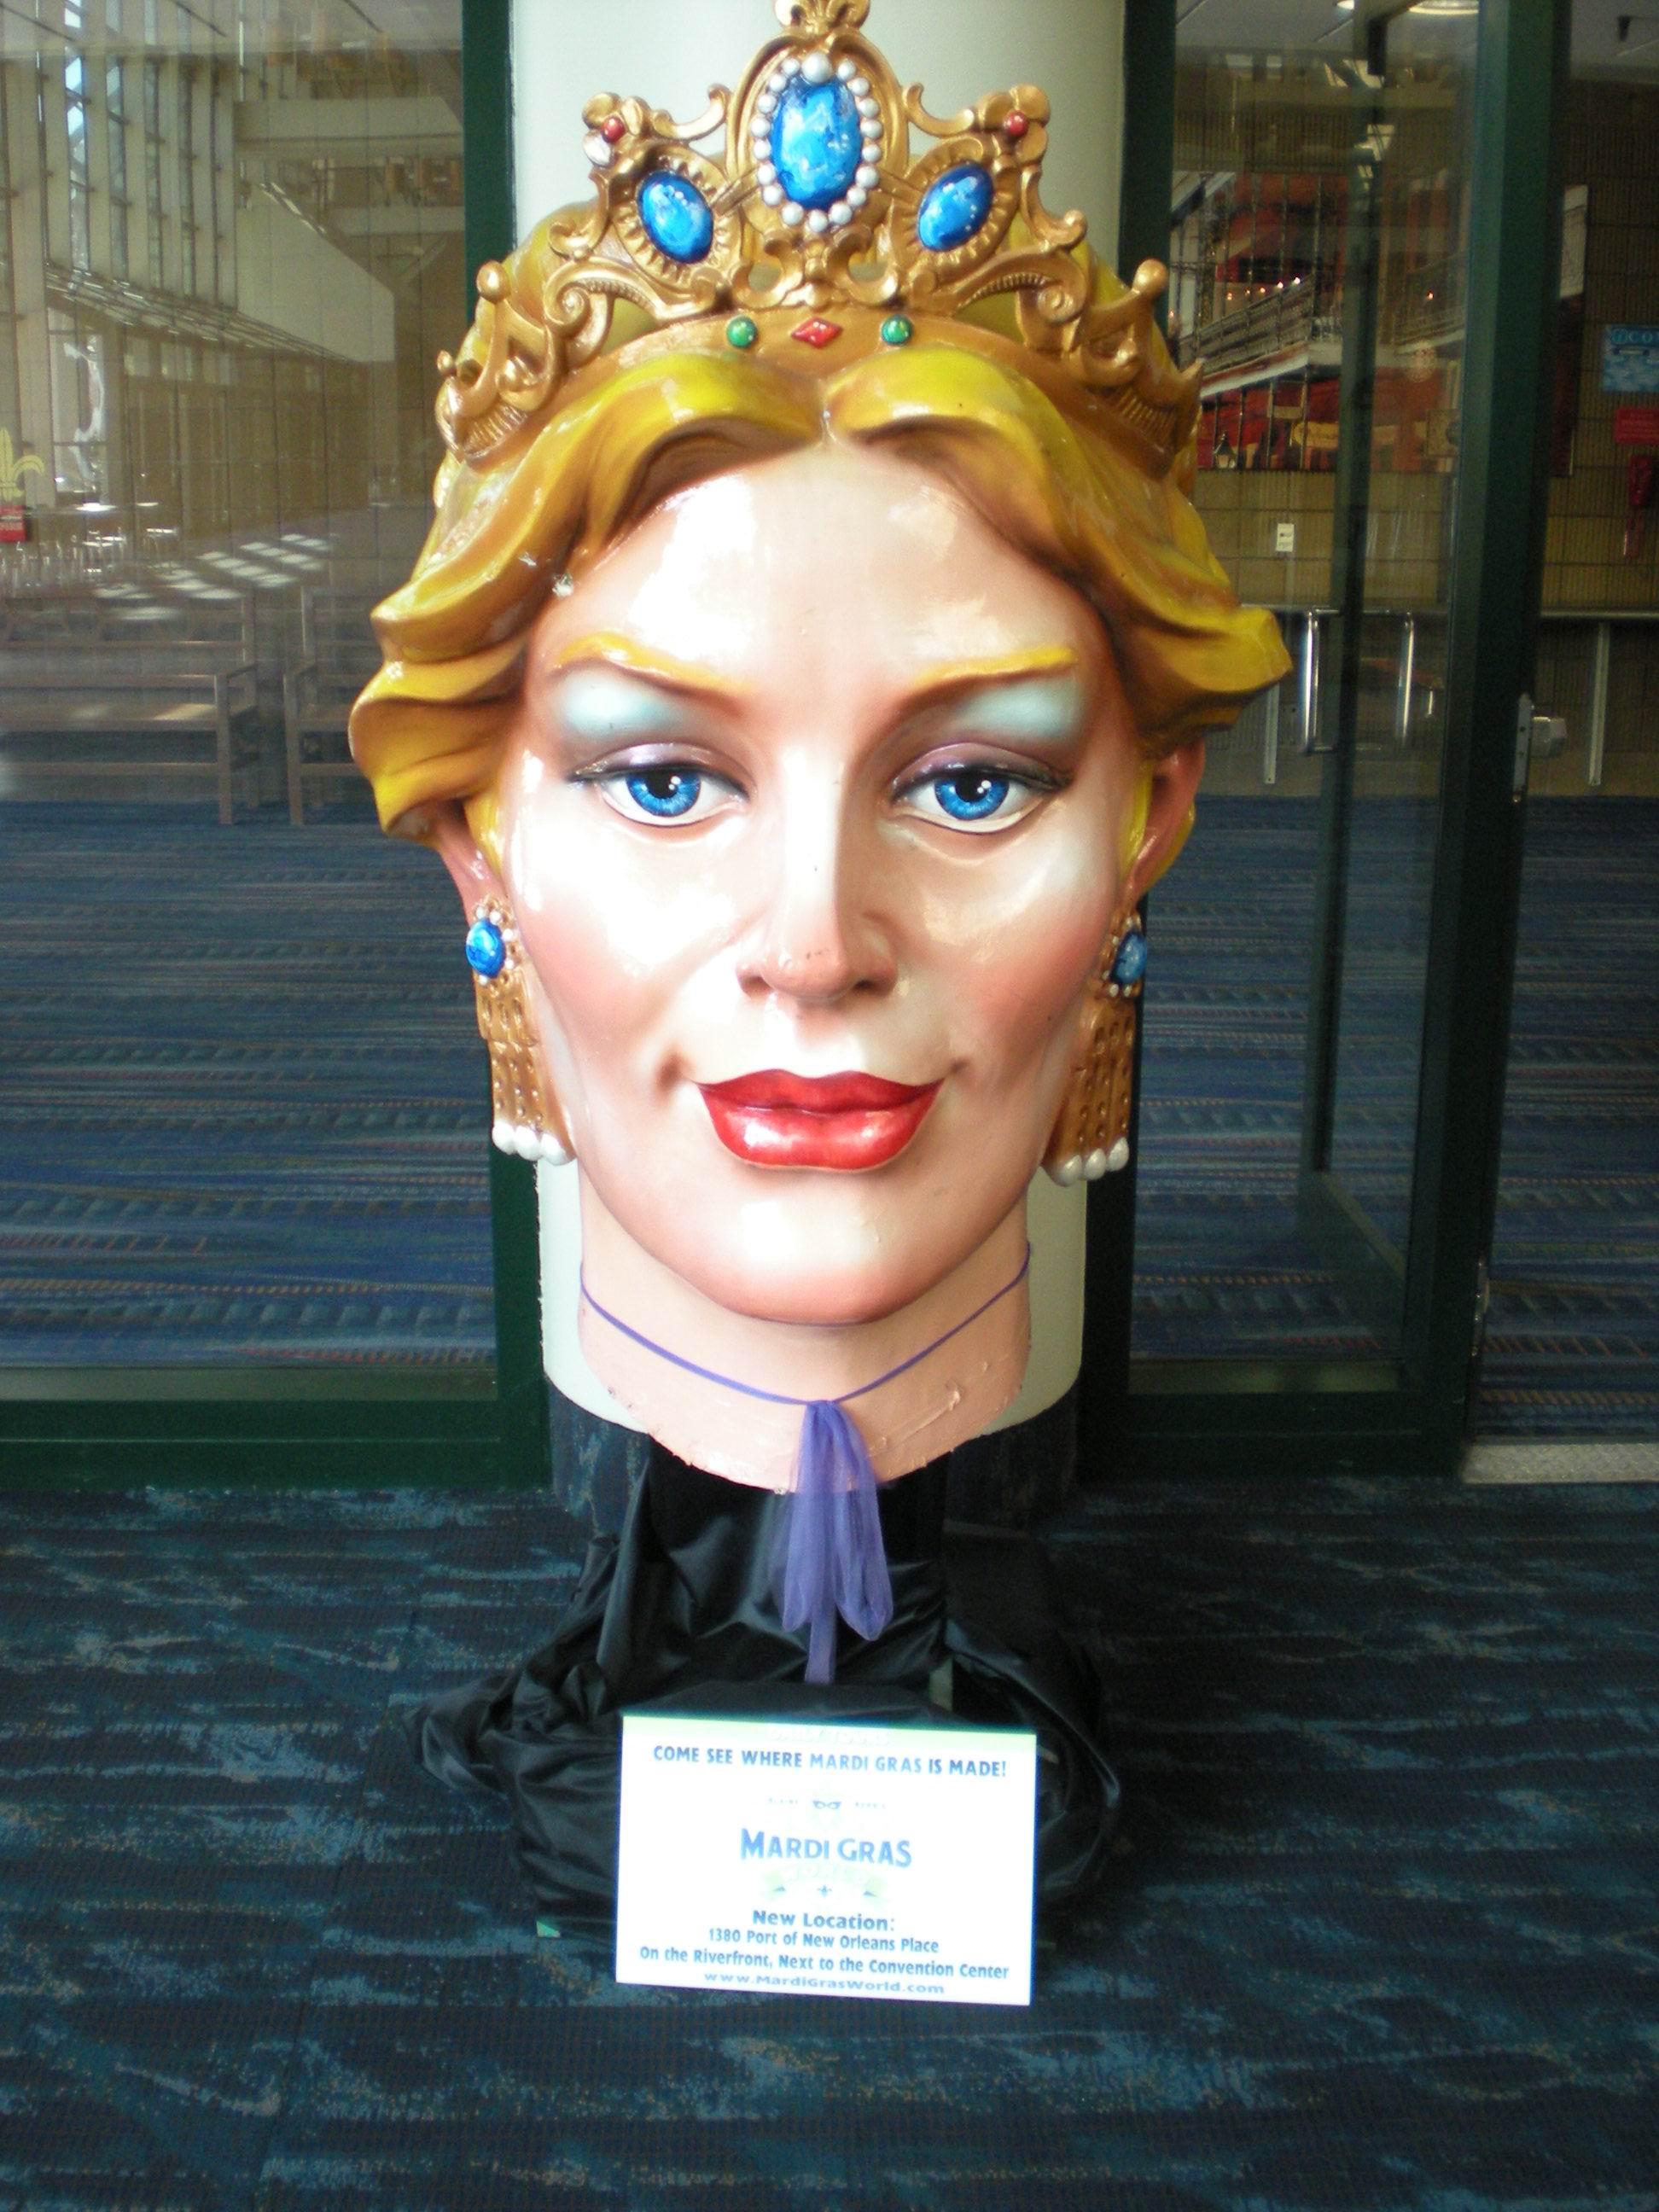 Mardi gras queen head photo